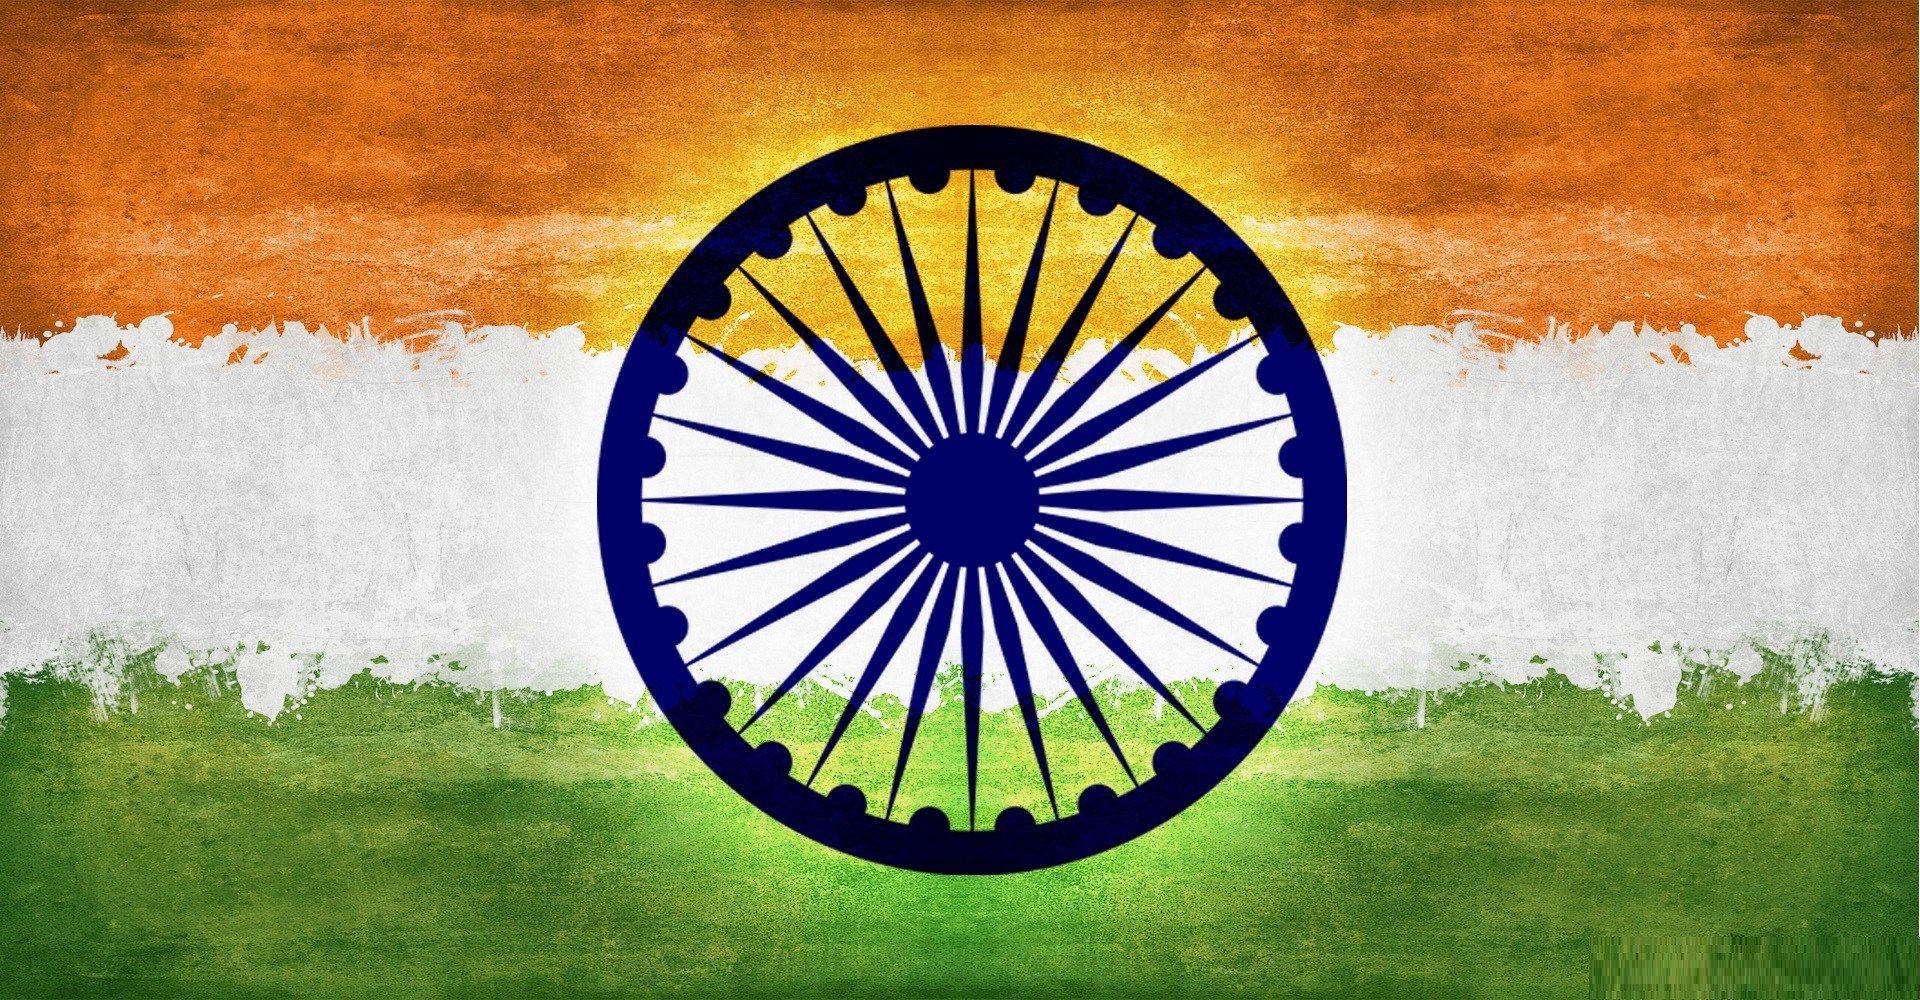 Indian Flag Images Indian Flag Images In Letters Indian Flag